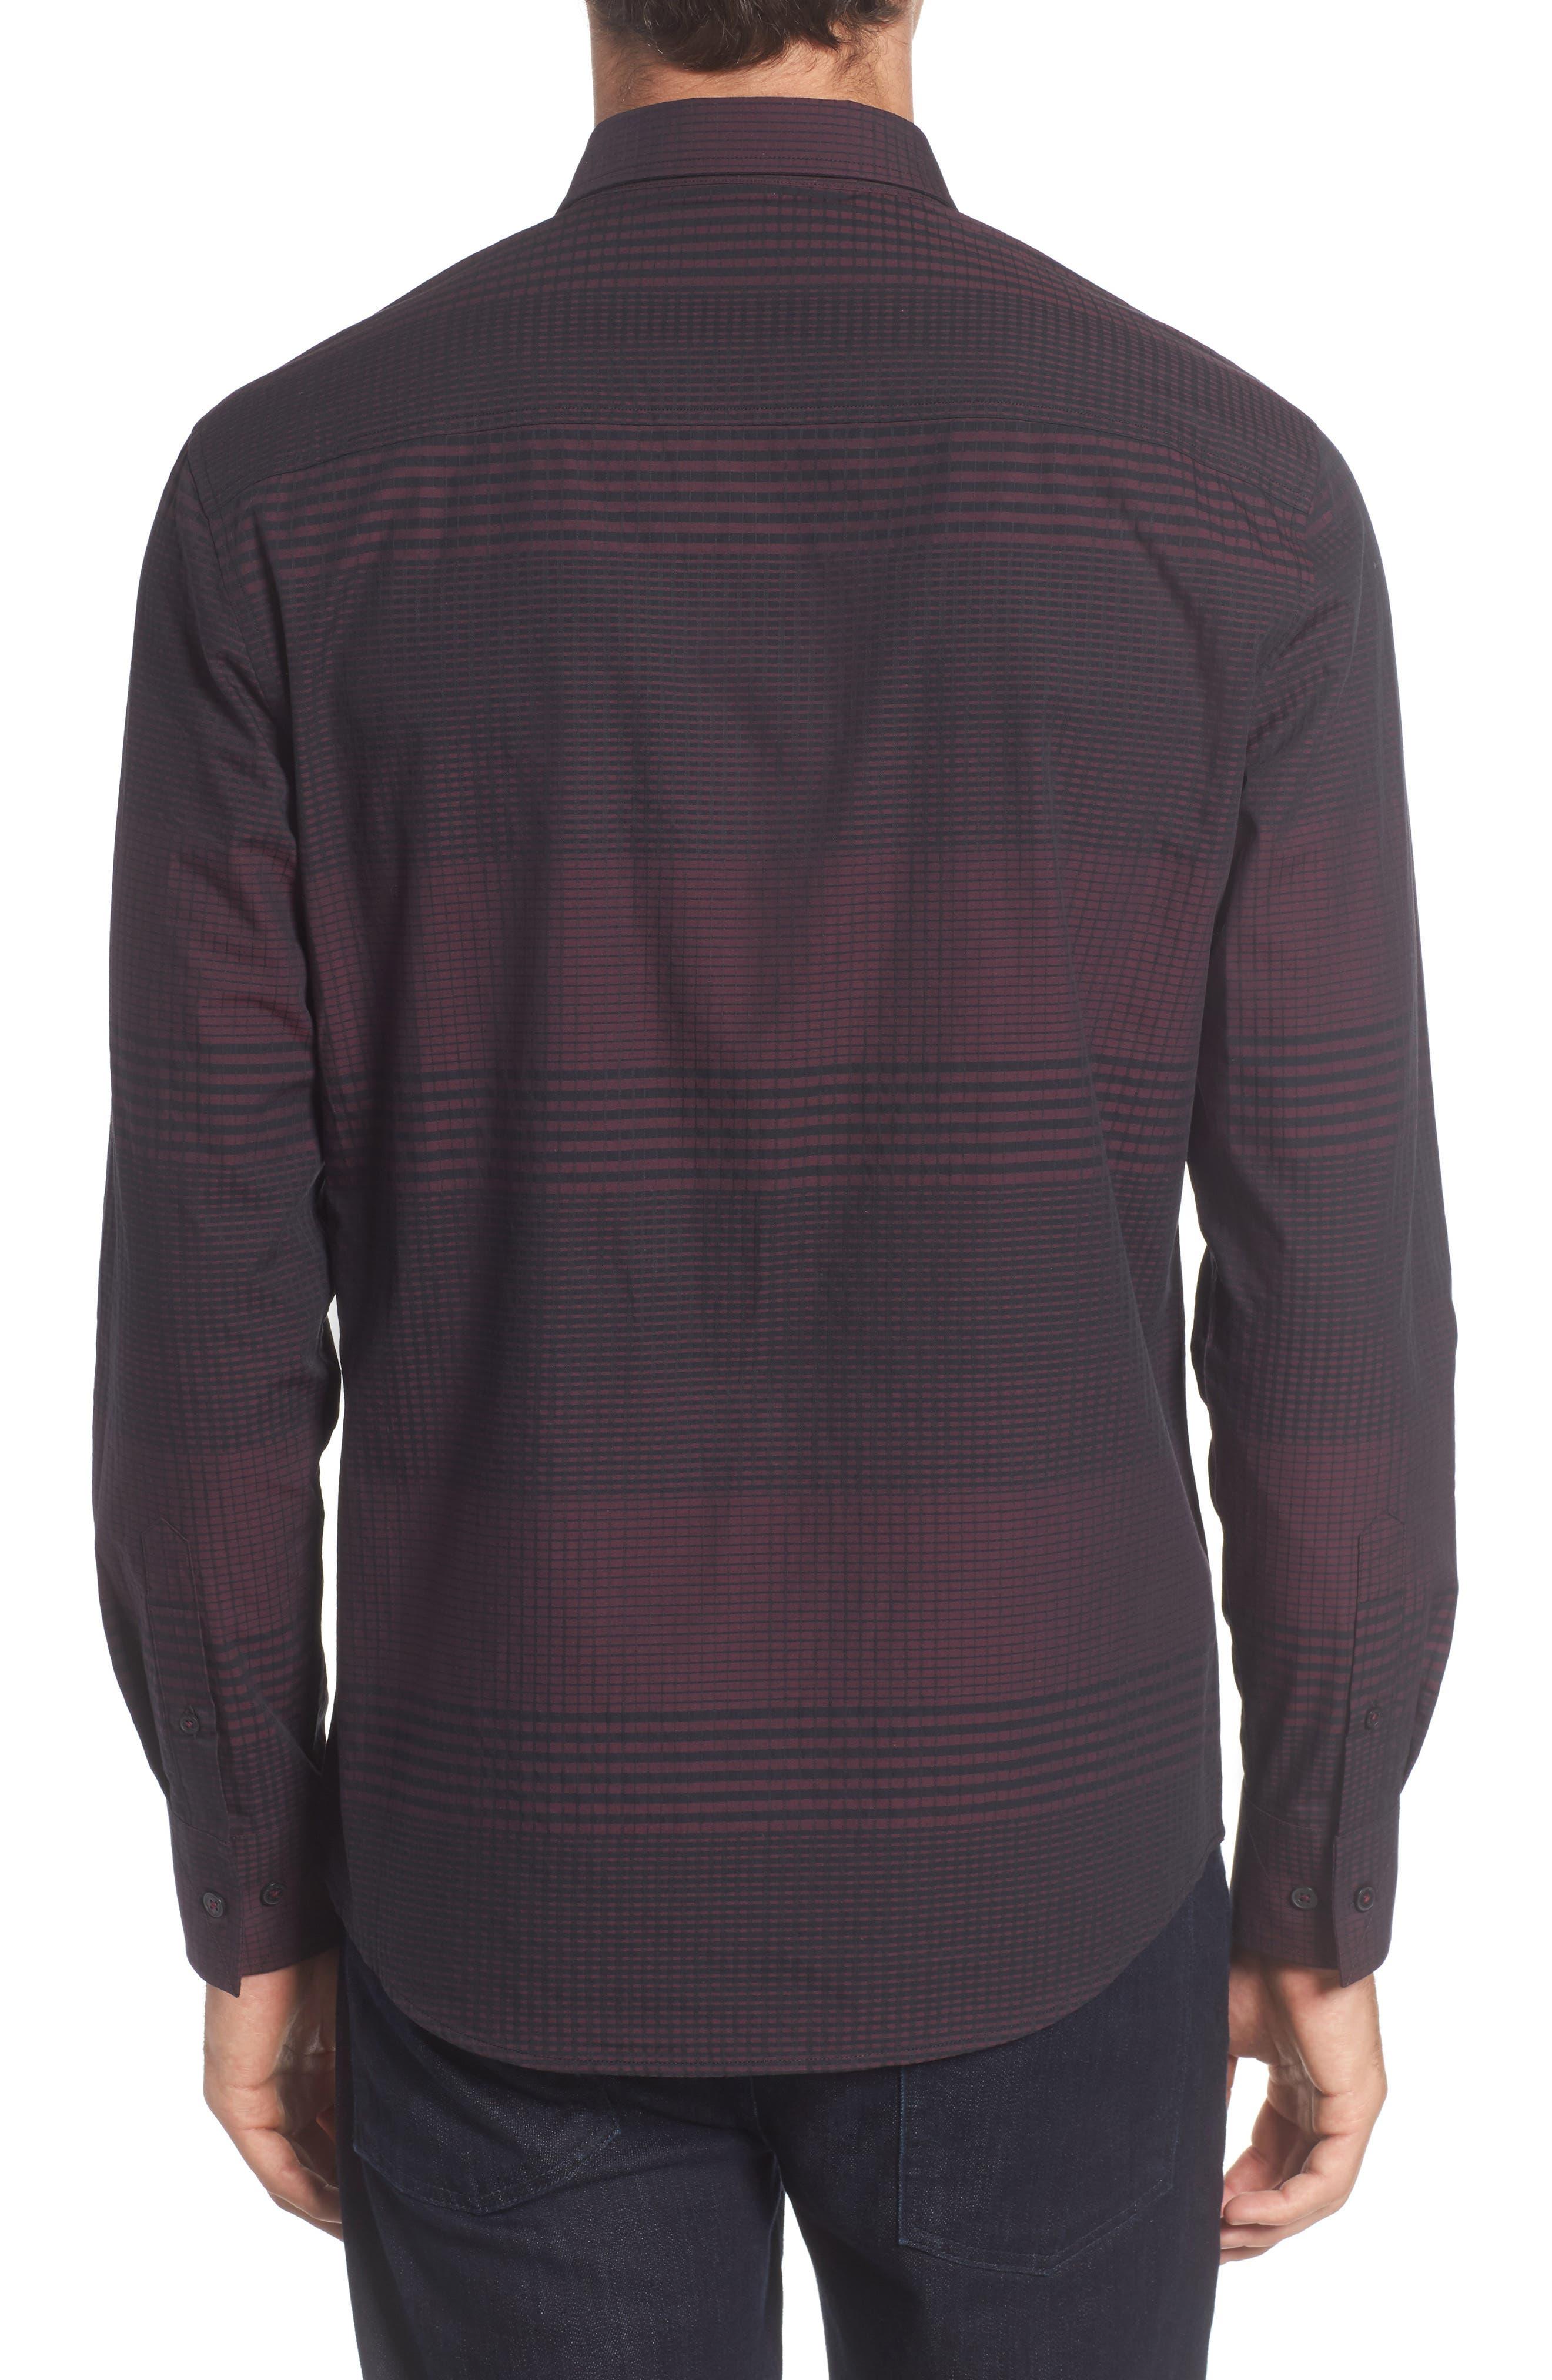 Alternate Image 2  - Vince Camuto Slim Fit Check Plaid Sport Shirt